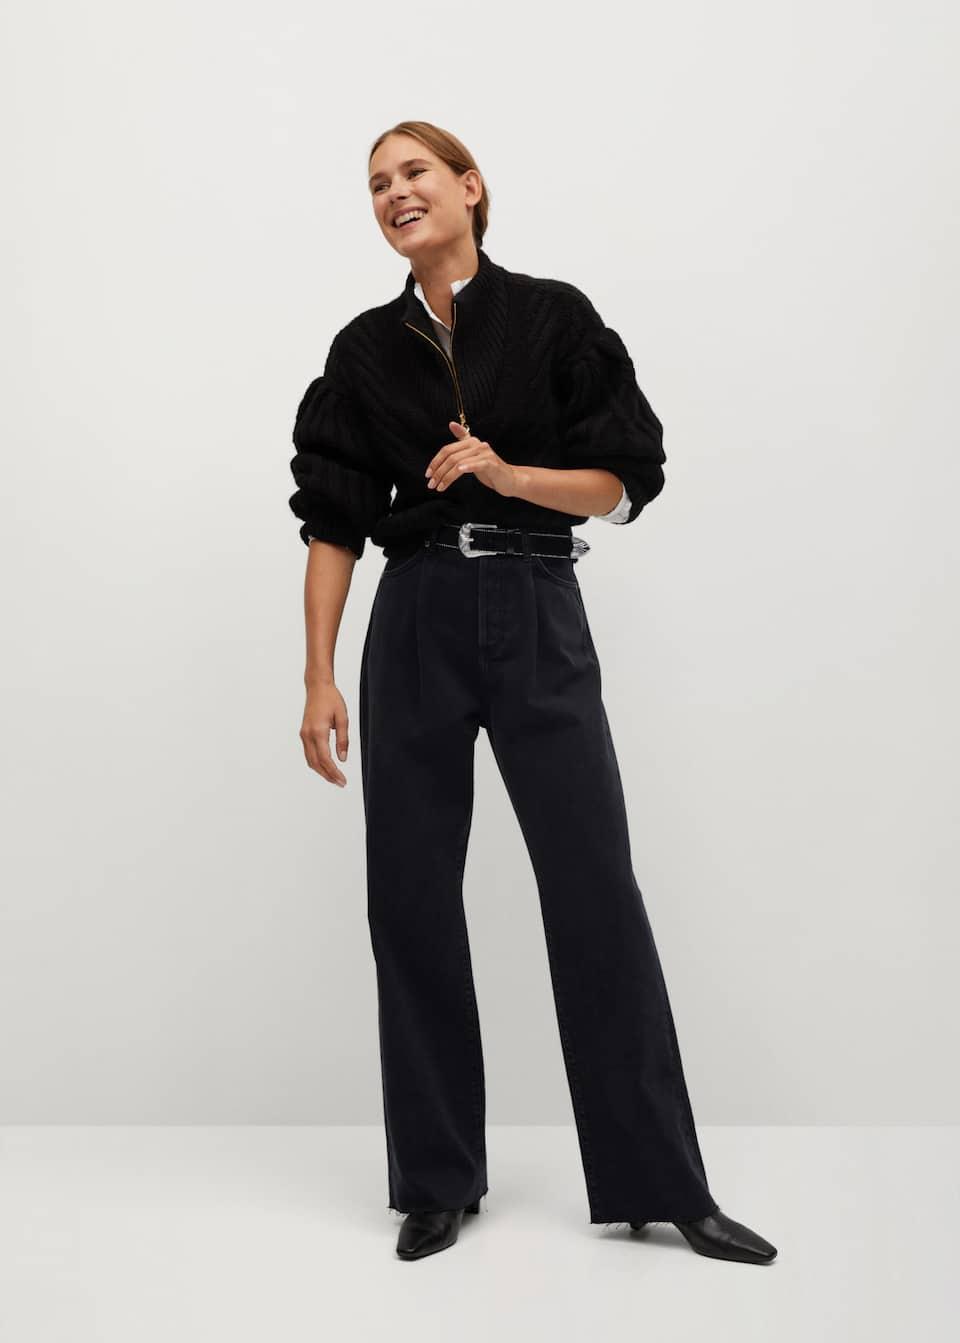 Jeans tiro alto Wideleg pinzas - Plano general